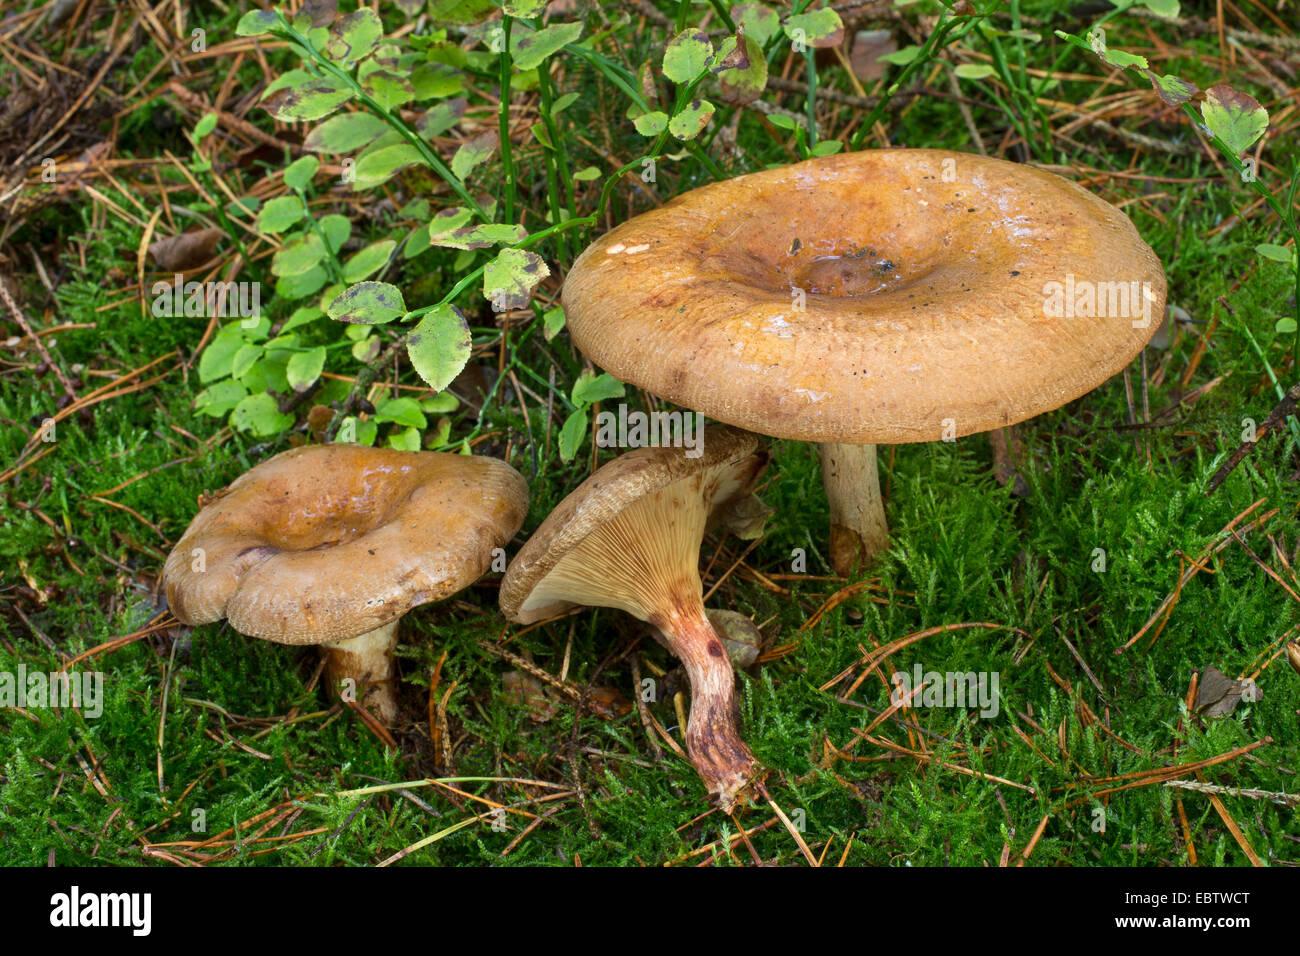 brown roll rim common roll rim poison pax paxillus involutus stock photo royalty free image. Black Bedroom Furniture Sets. Home Design Ideas